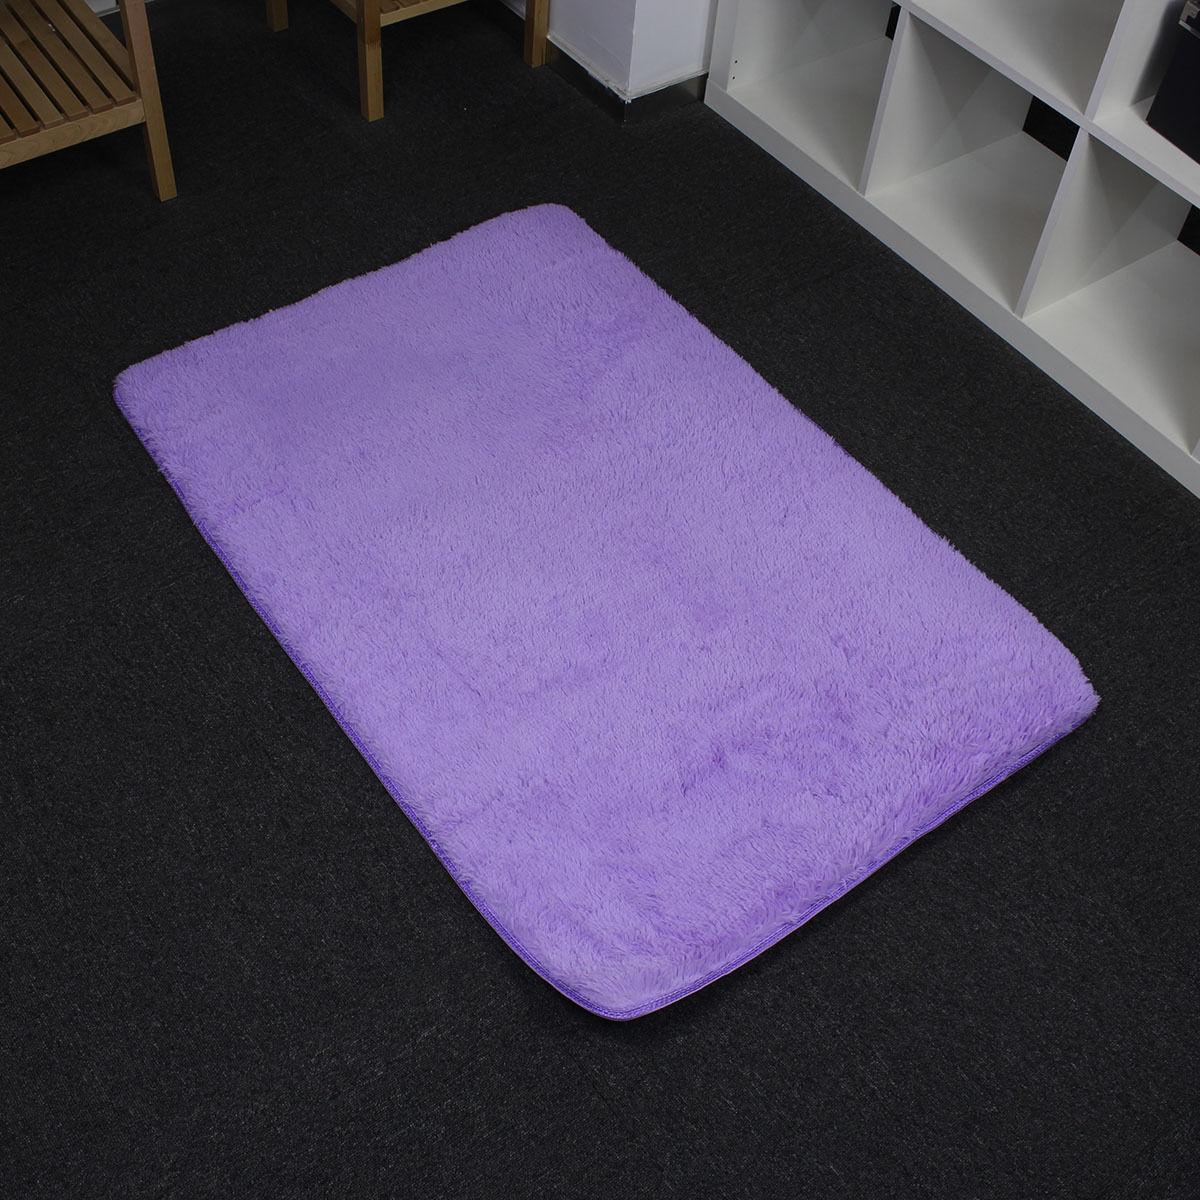 Anti-skid Soft Floor Carpet Living Bedroom Shaggy Rooms